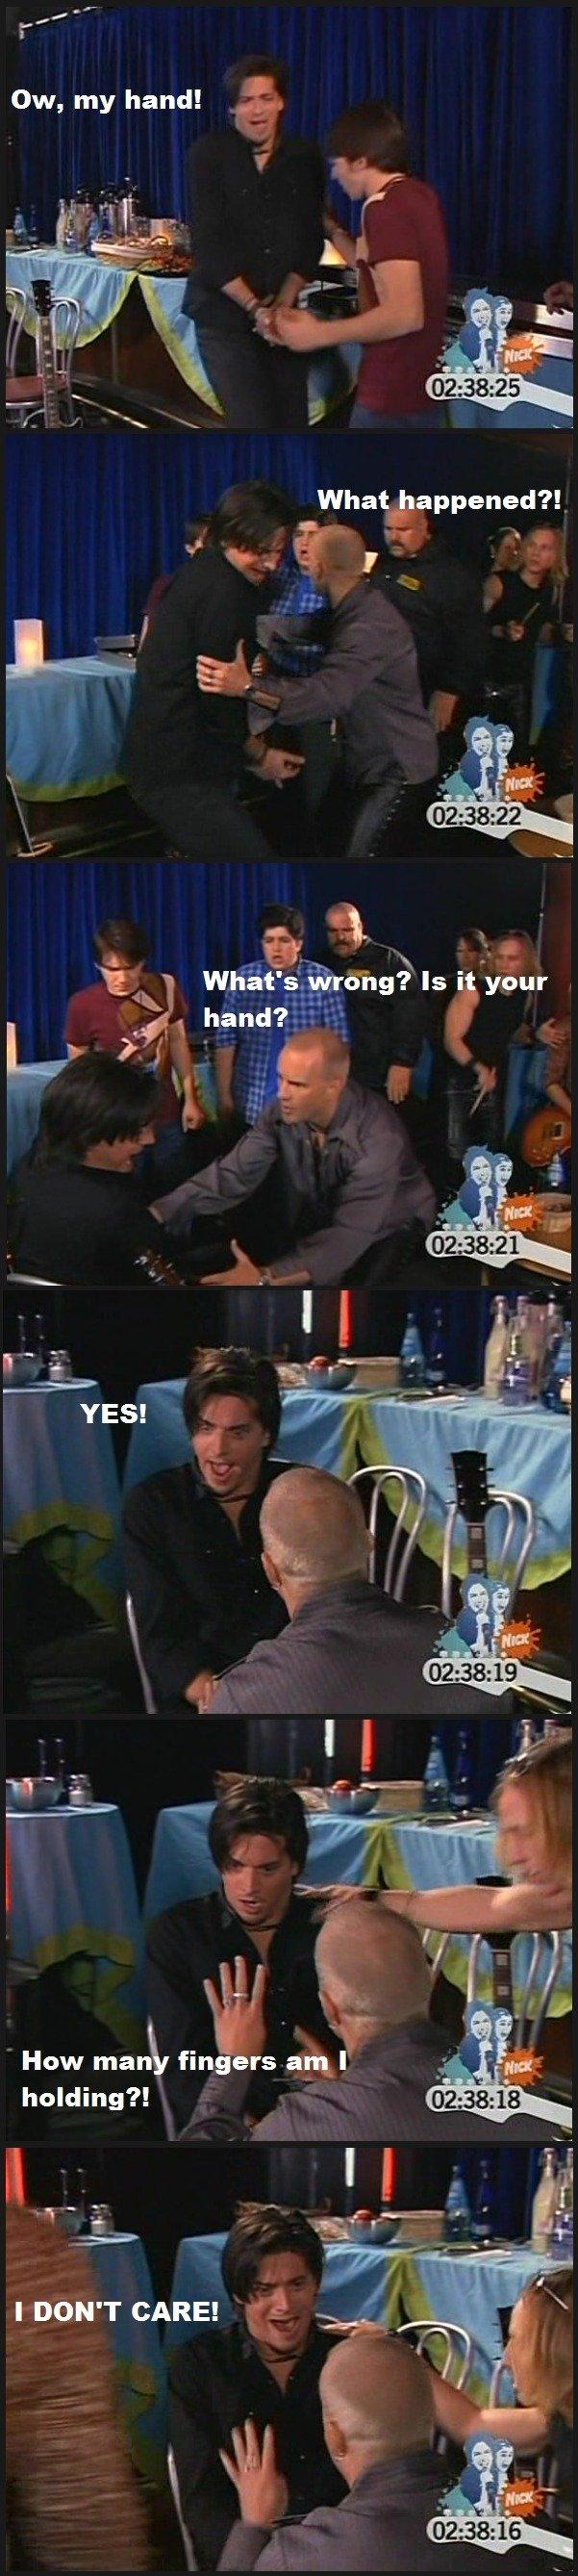 "Devin Malone. . F' handa"" How man fingers aful holding'?, Devin Malone F' handa"" How man fingers aful holding'?"